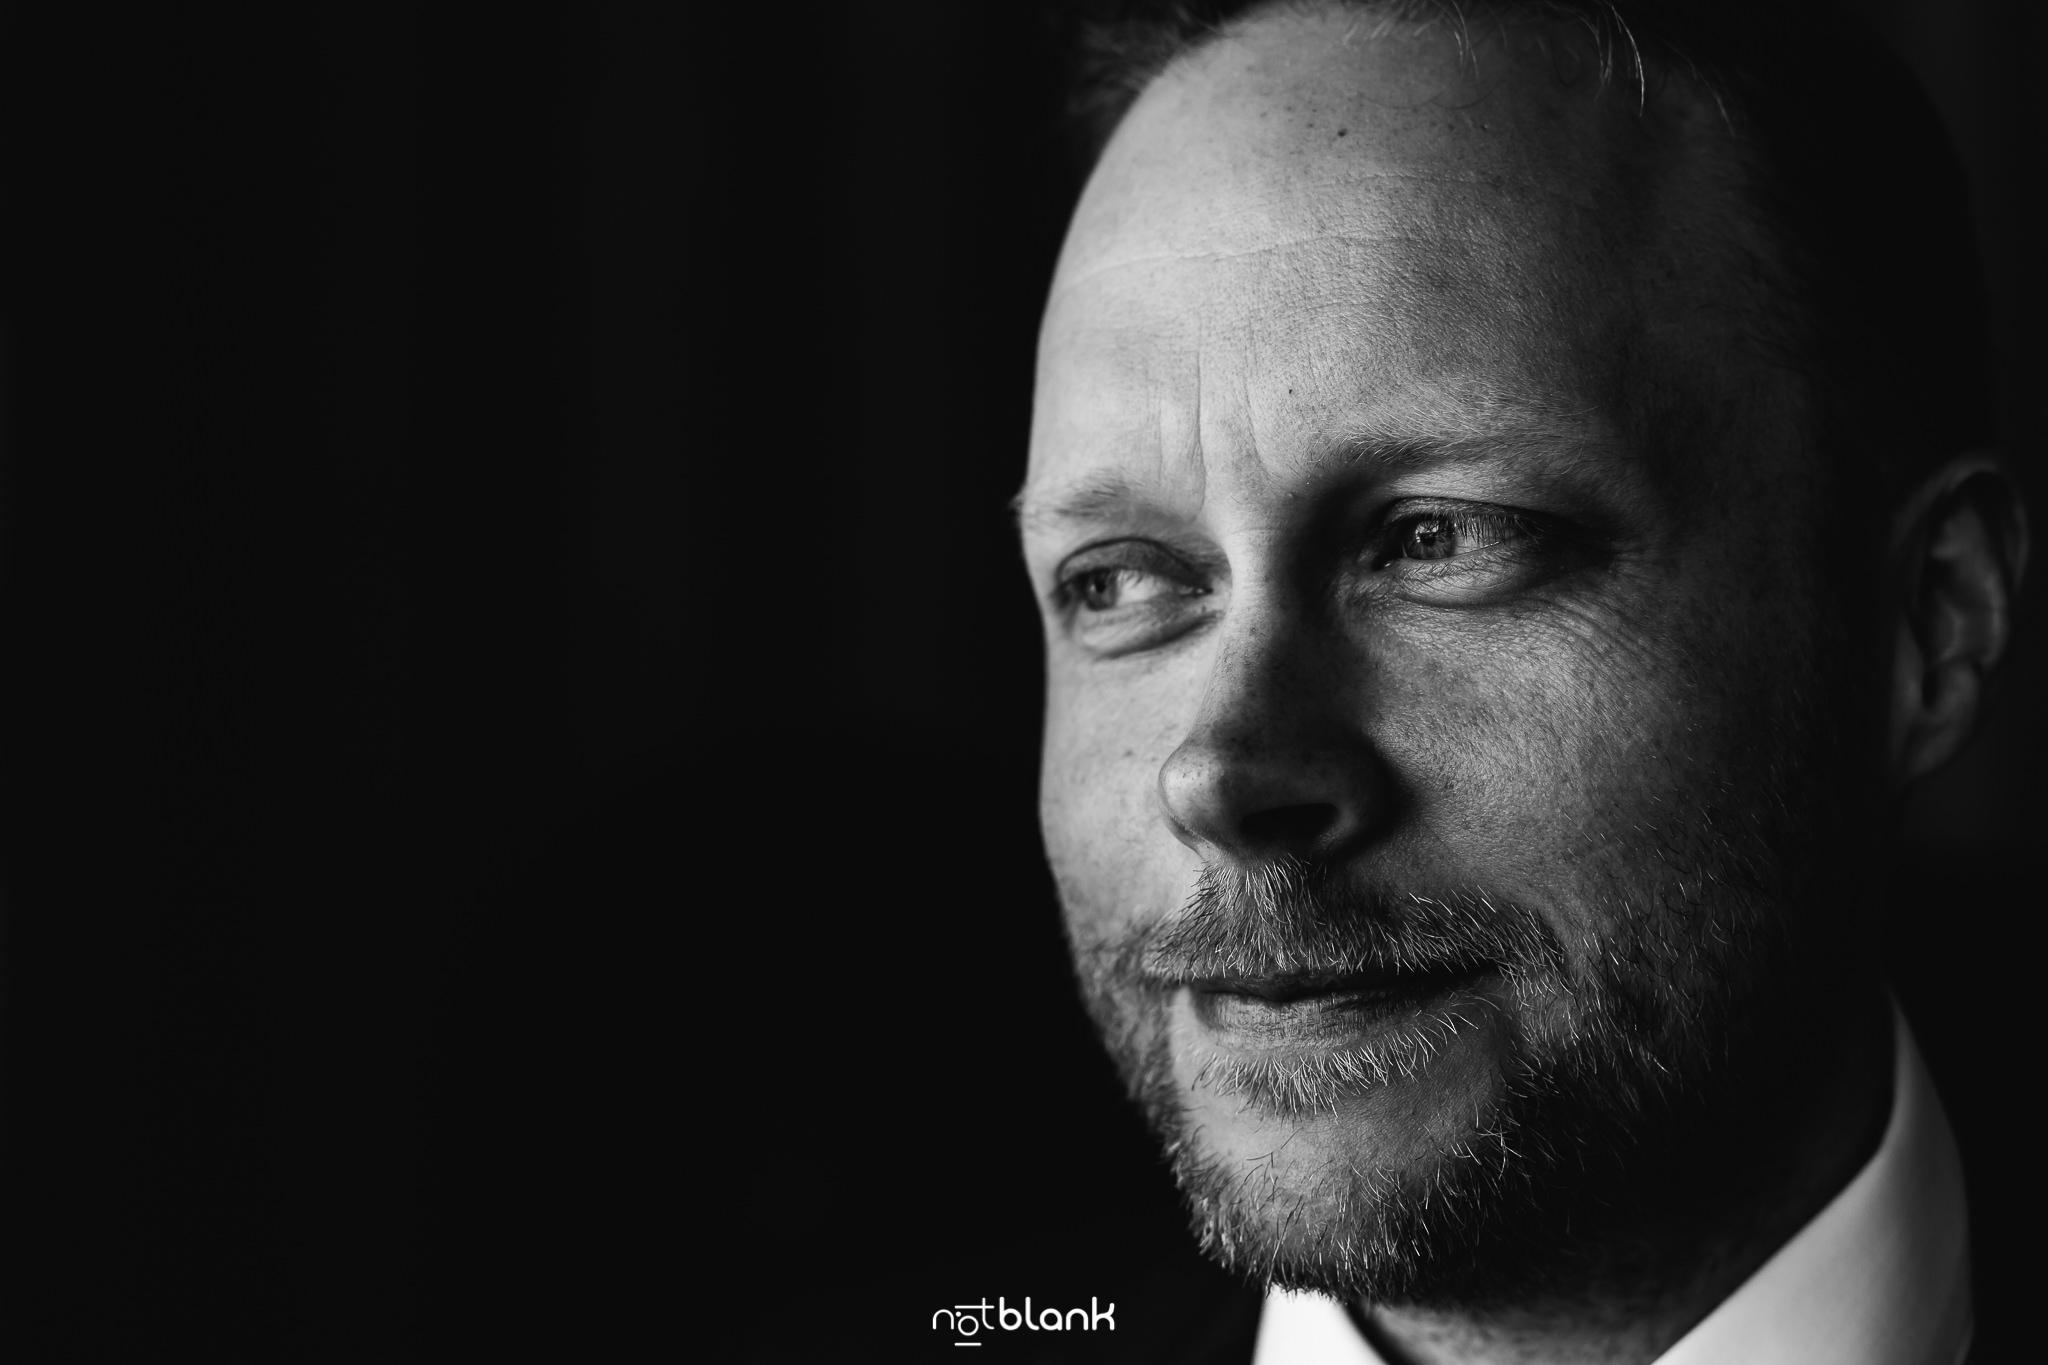 Boda-Maite-David-Retrato-Novio. Reportaje realizado por Notblank fotógrafos de boda